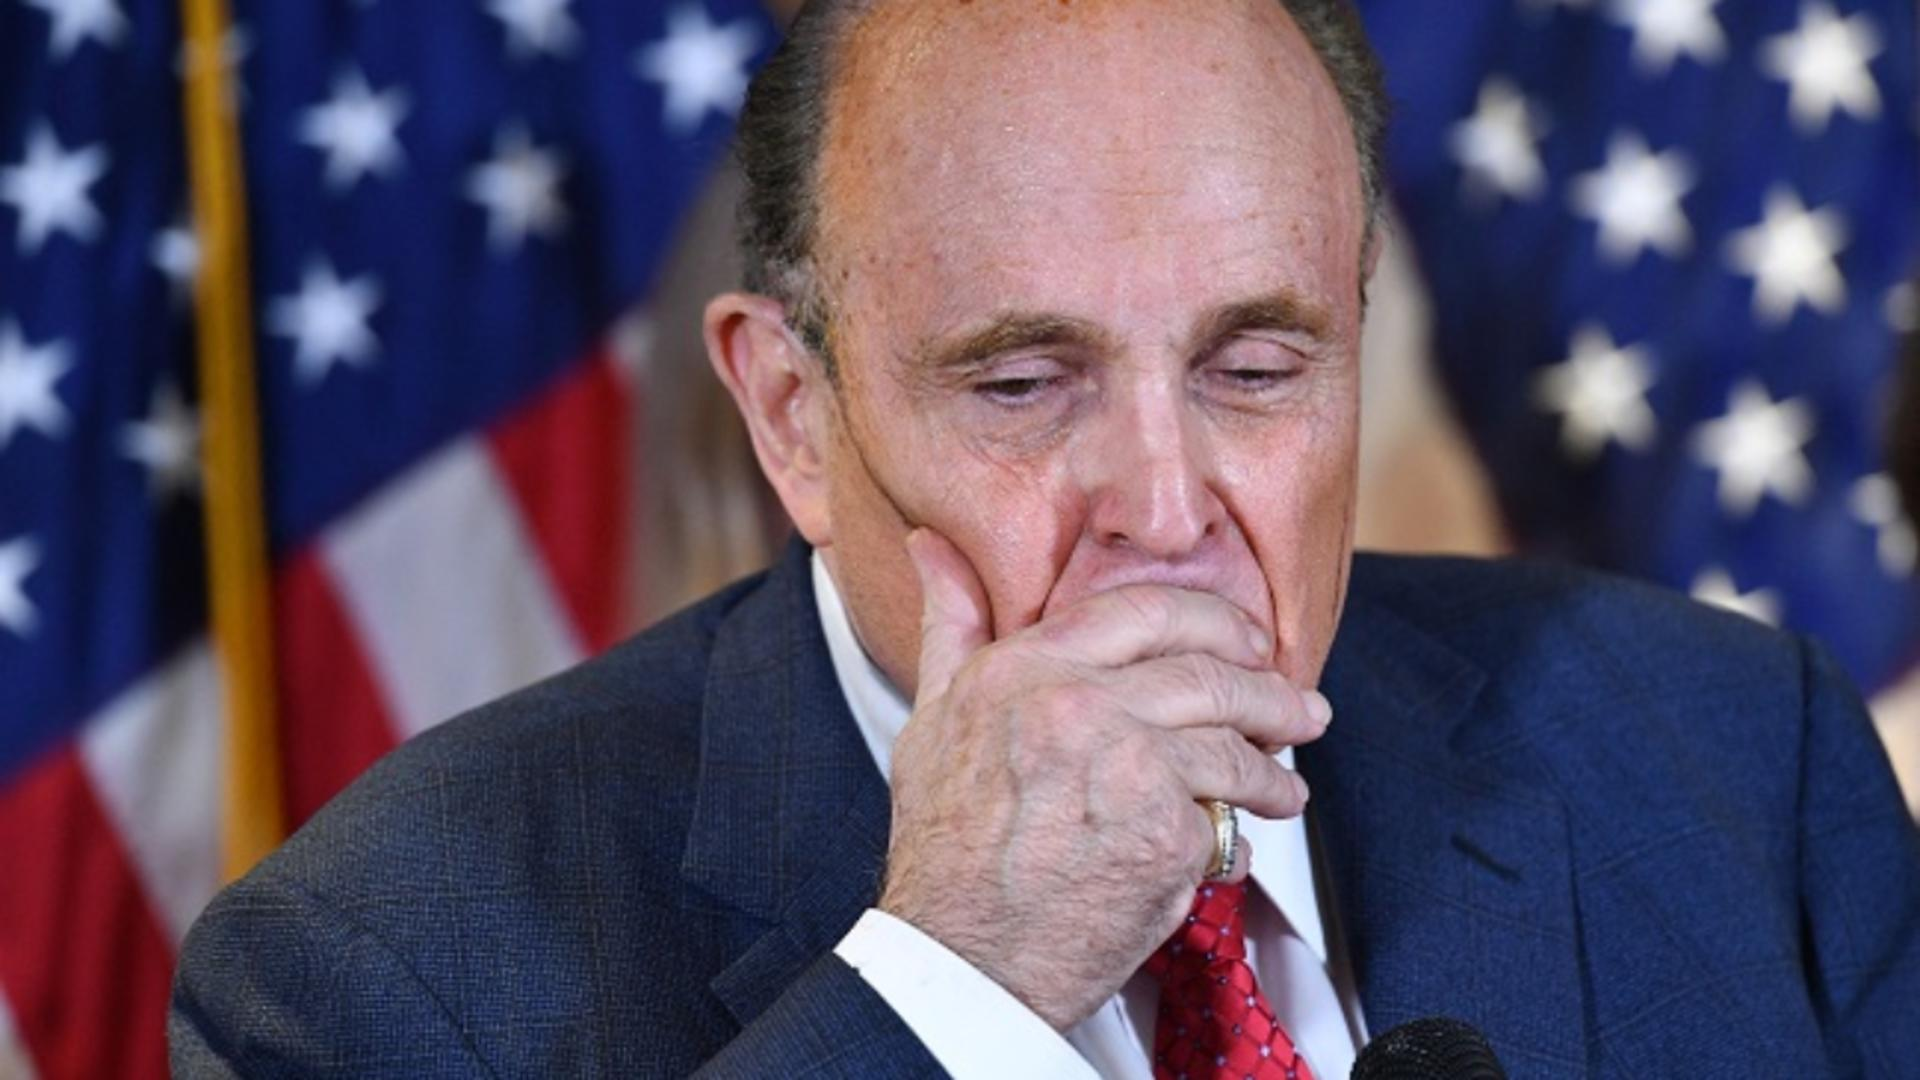 Rudy Giuliani/sursa foto: Twitter/Channels Television